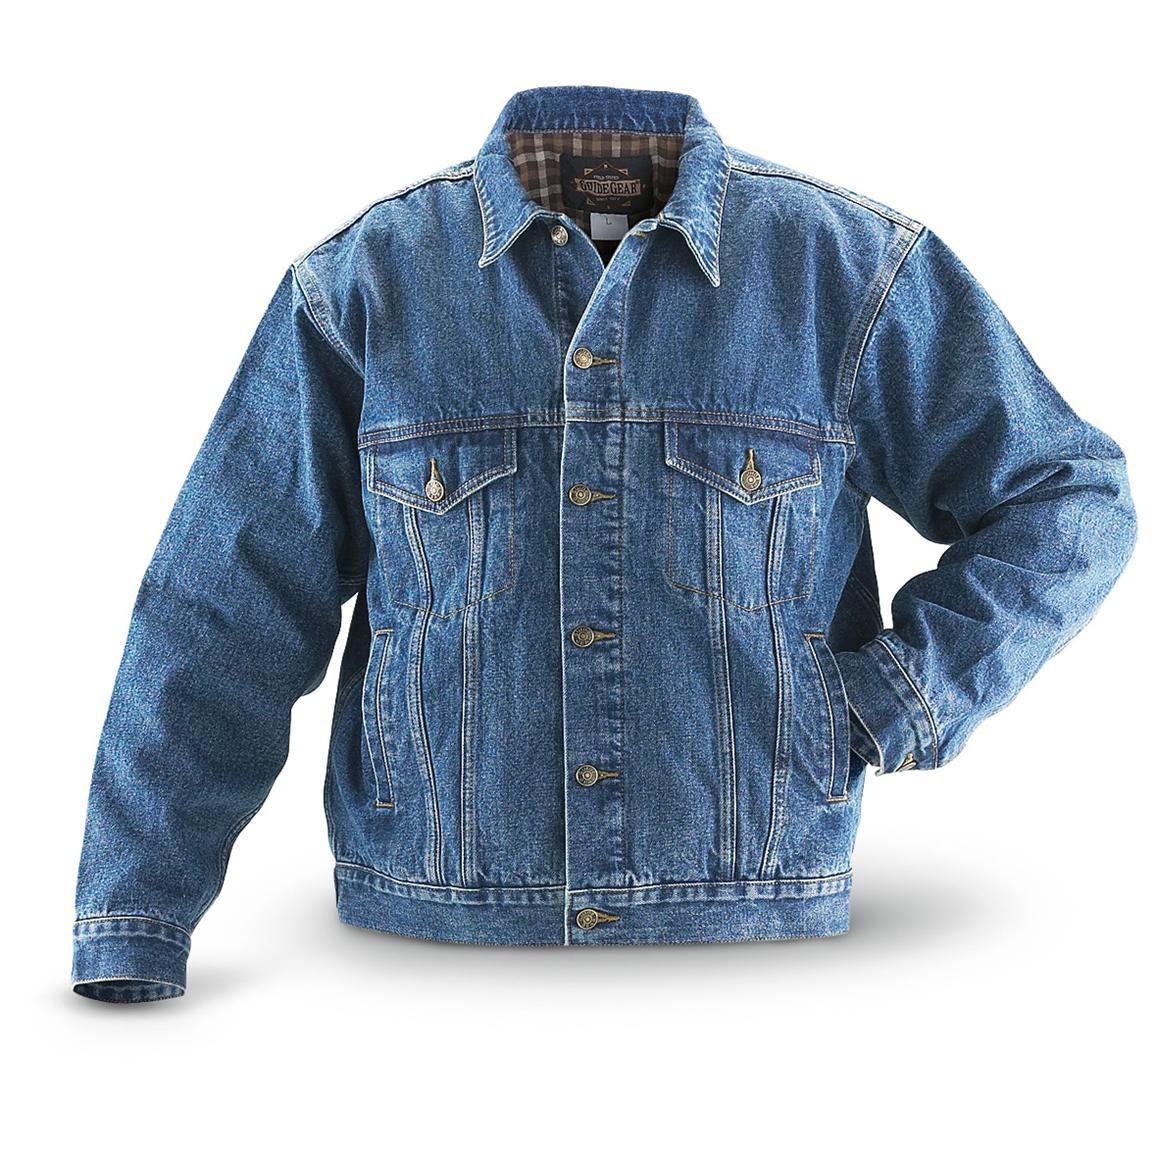 jean jackets guide gear flannel-lined denim jean jacket, stonewash ioqzuvi